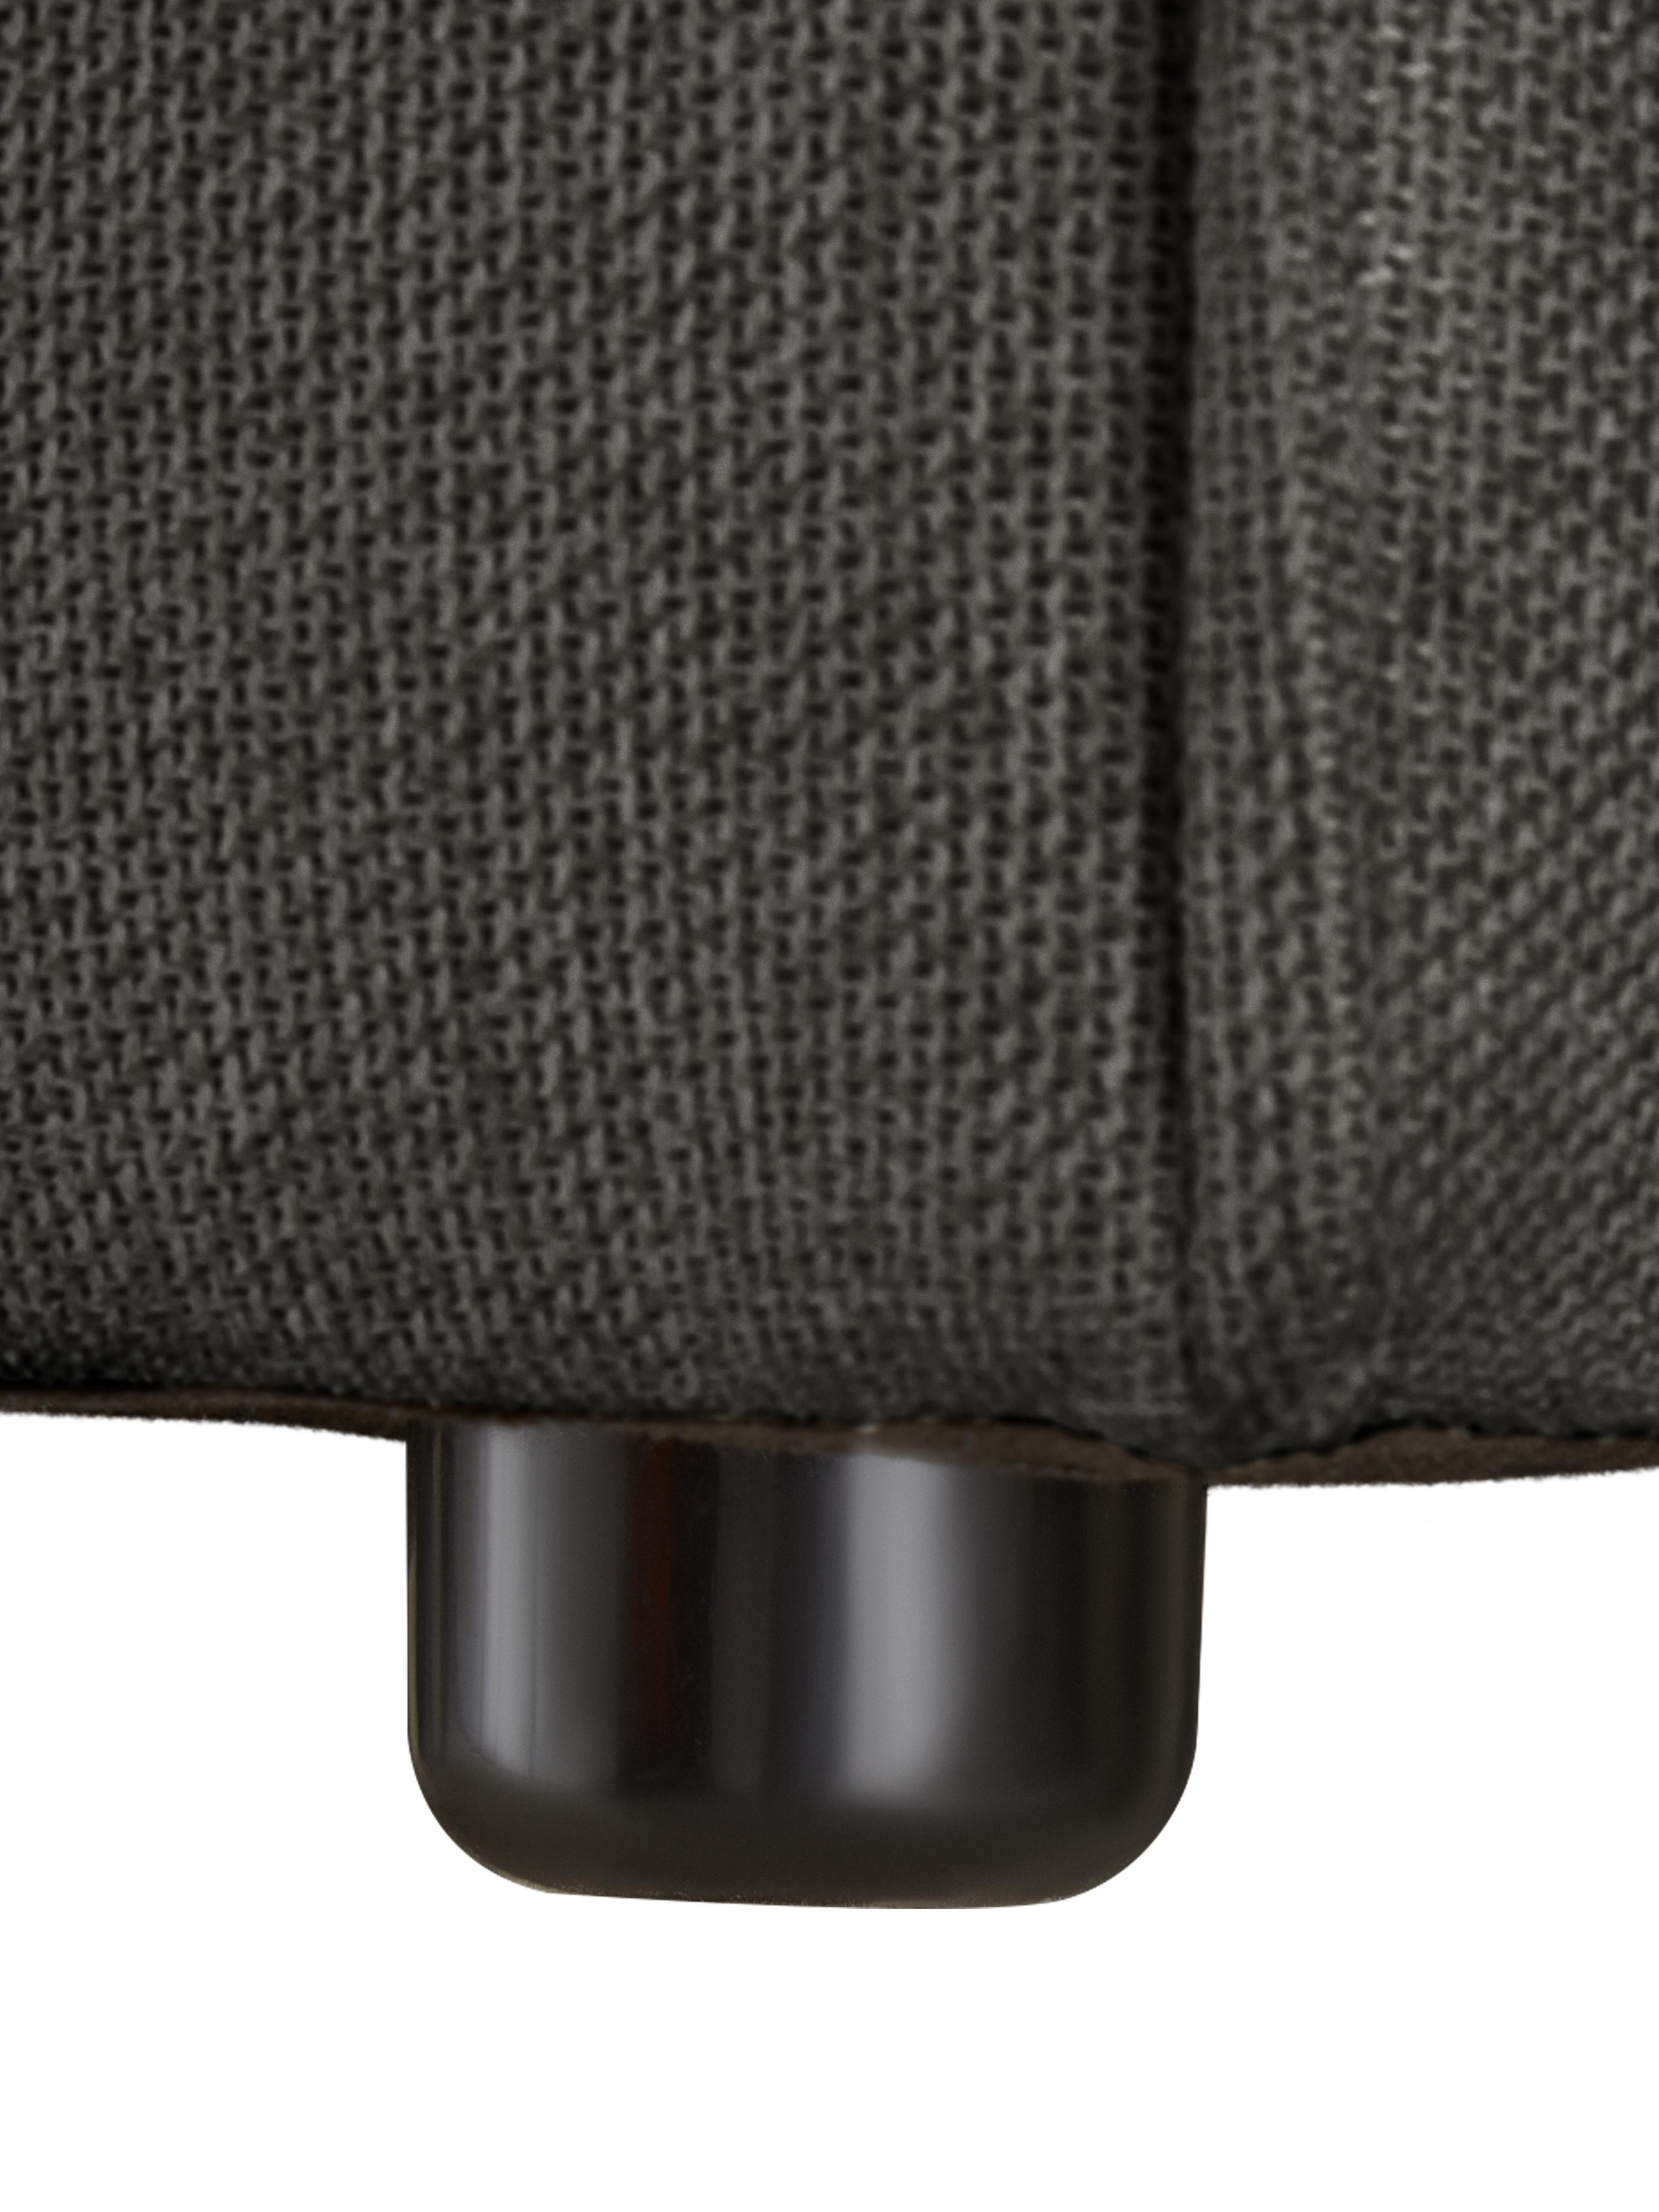 Modulare Ottomane Lennon, Bezug: Polyester Der hochwertige, Gestell: Massives Kiefernholz, Spe, Füße: Kunststoff, Webstoff Anthrazit, B 269 x T 119 cm